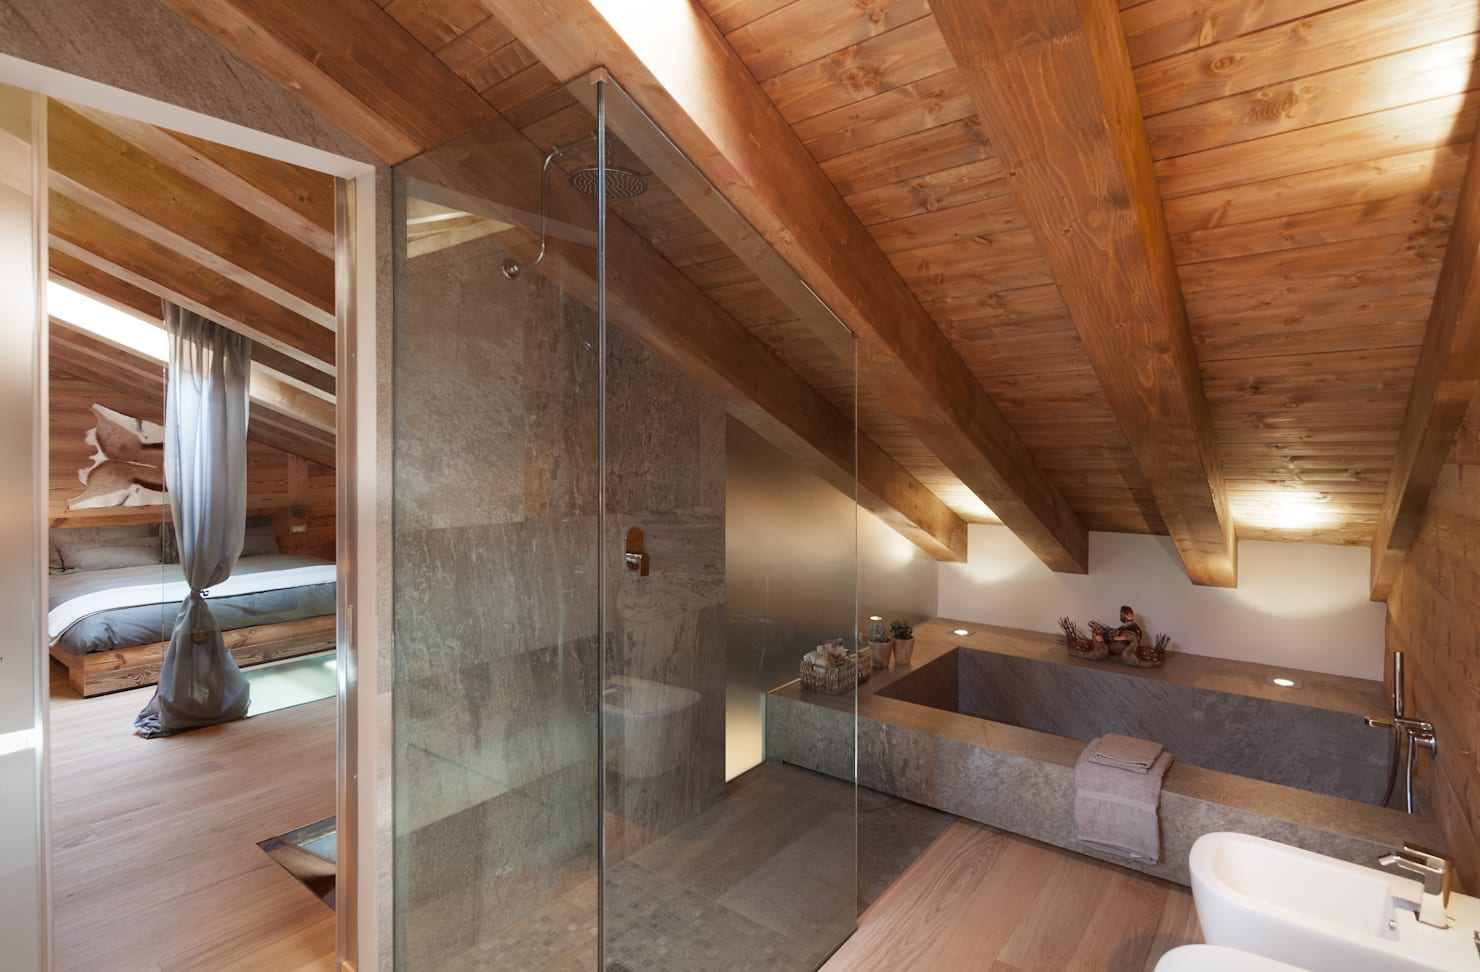 10 serene and beautiful bathrooms